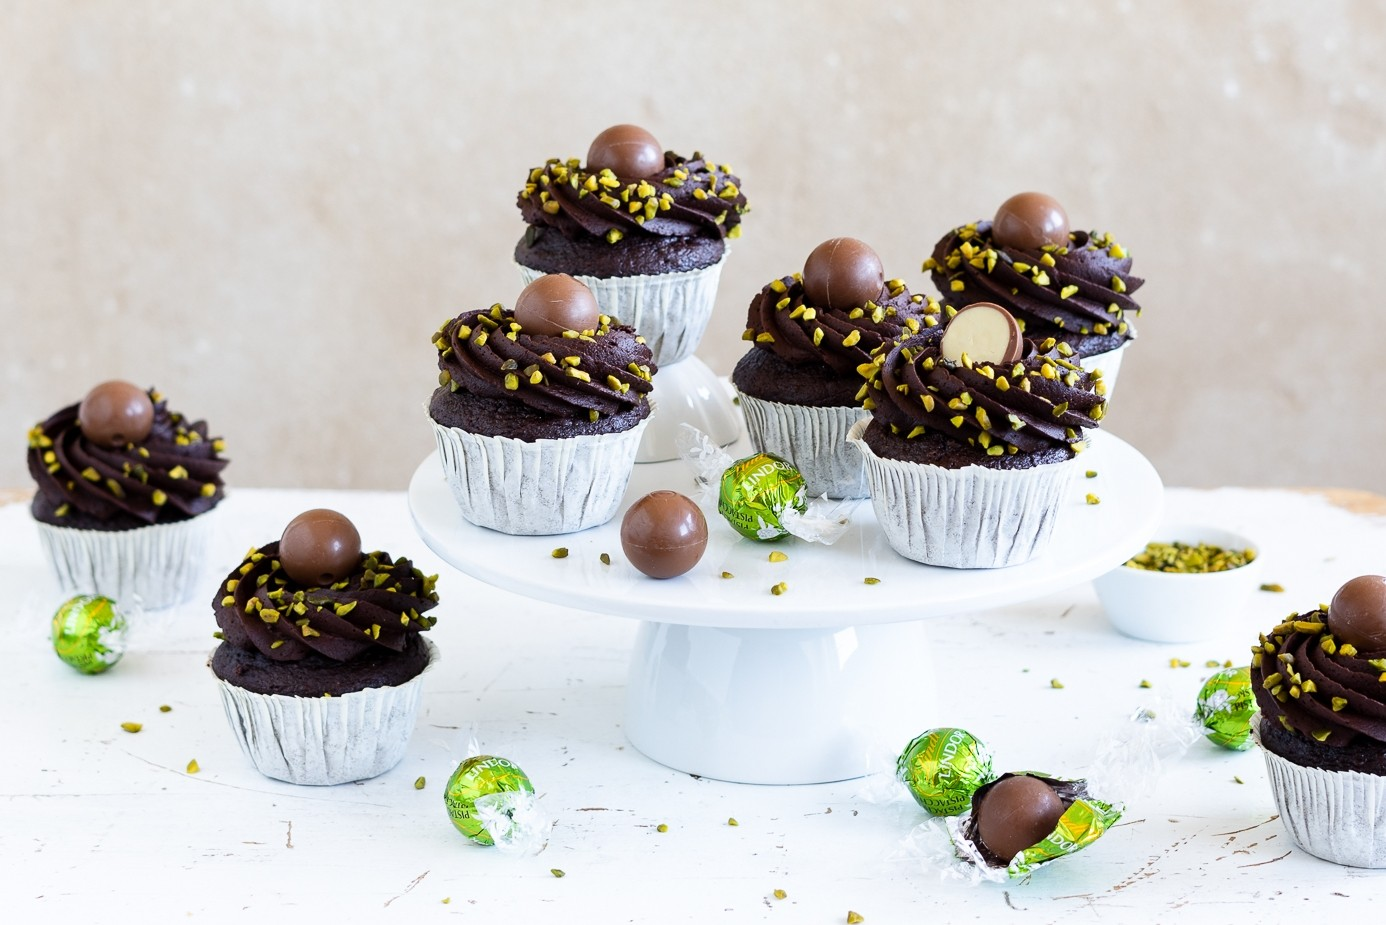 Schoko-Pistazien-Cupcakes mit Kakao-Buttercreme-Frosting